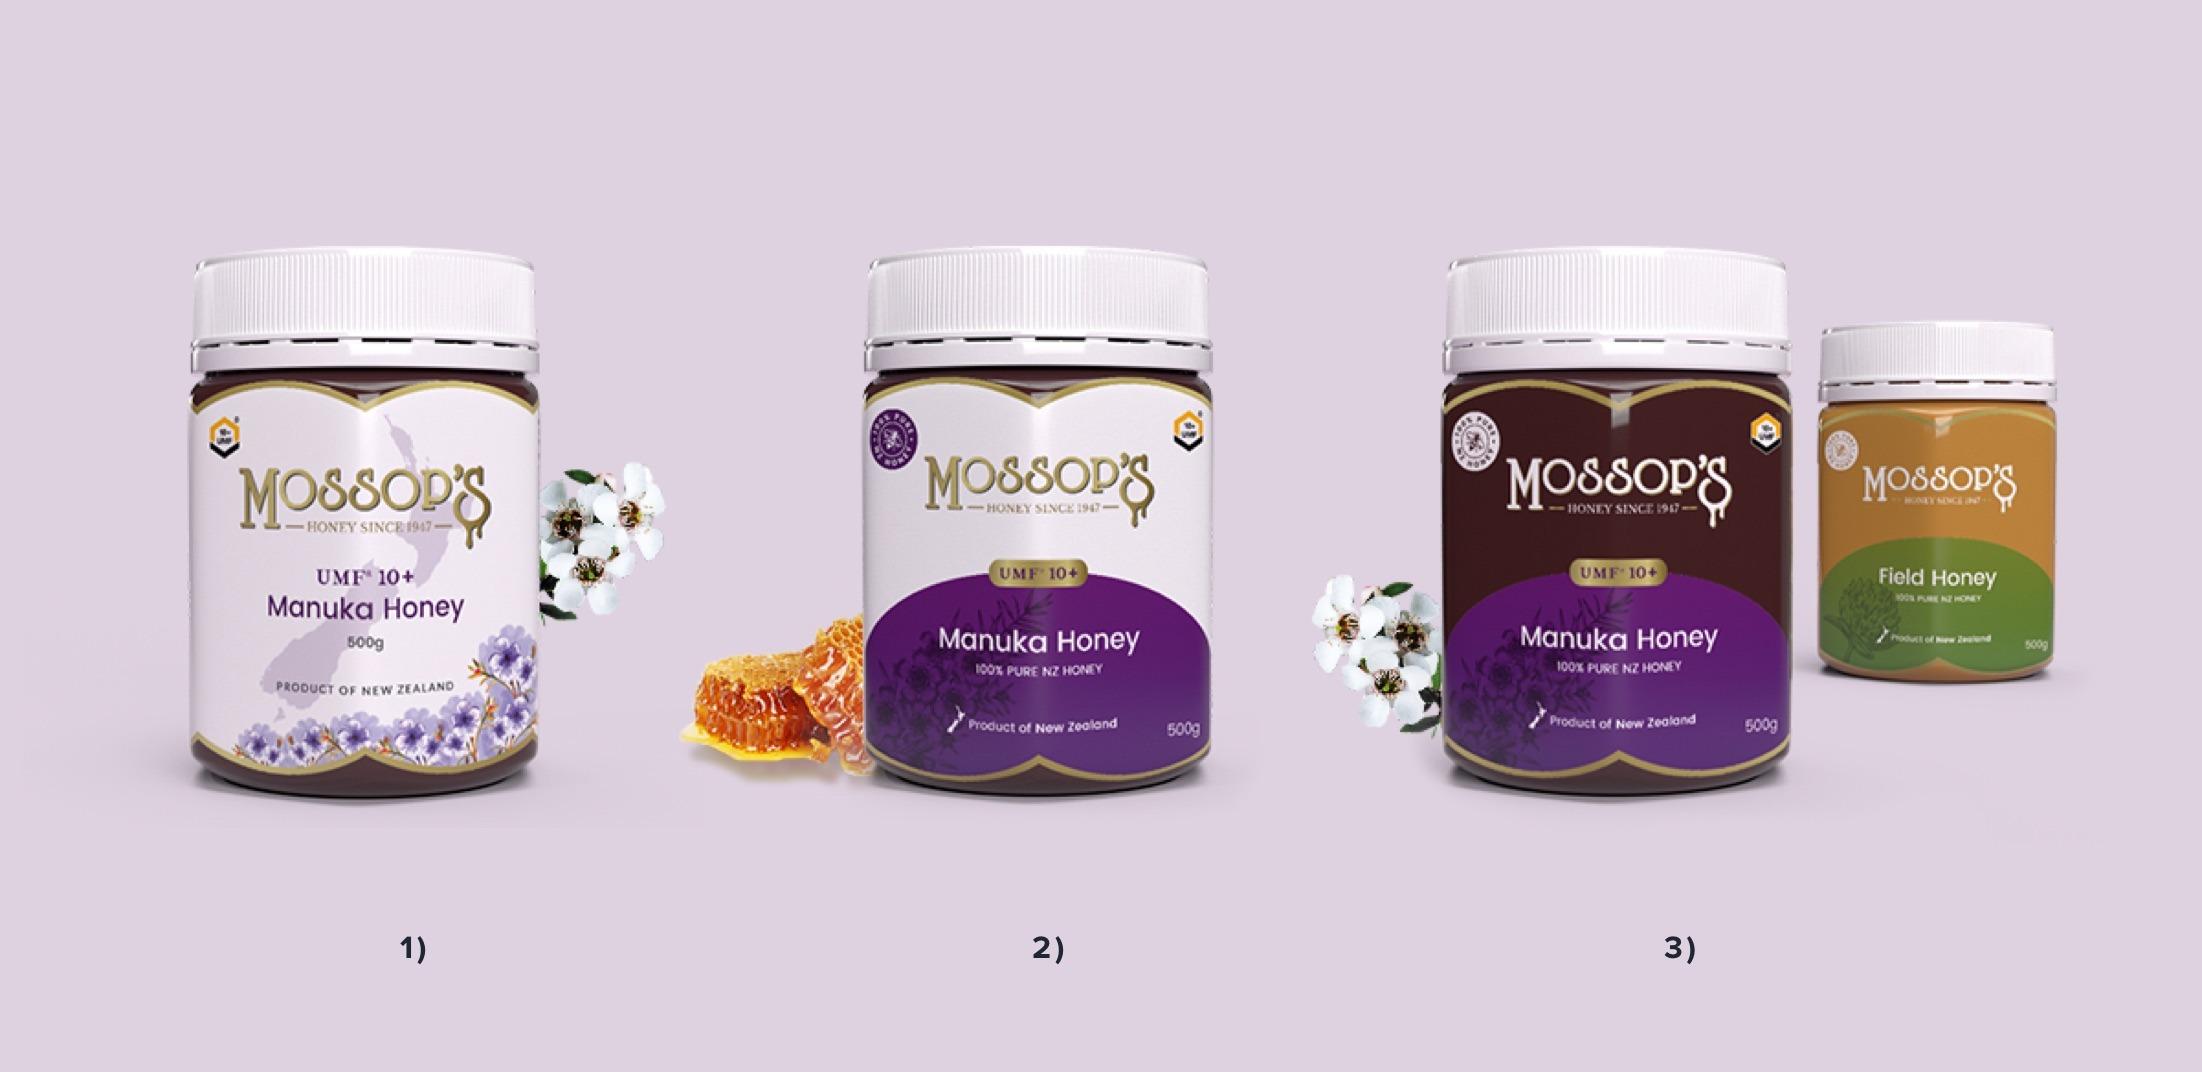 Product Design - Mossop's Honey